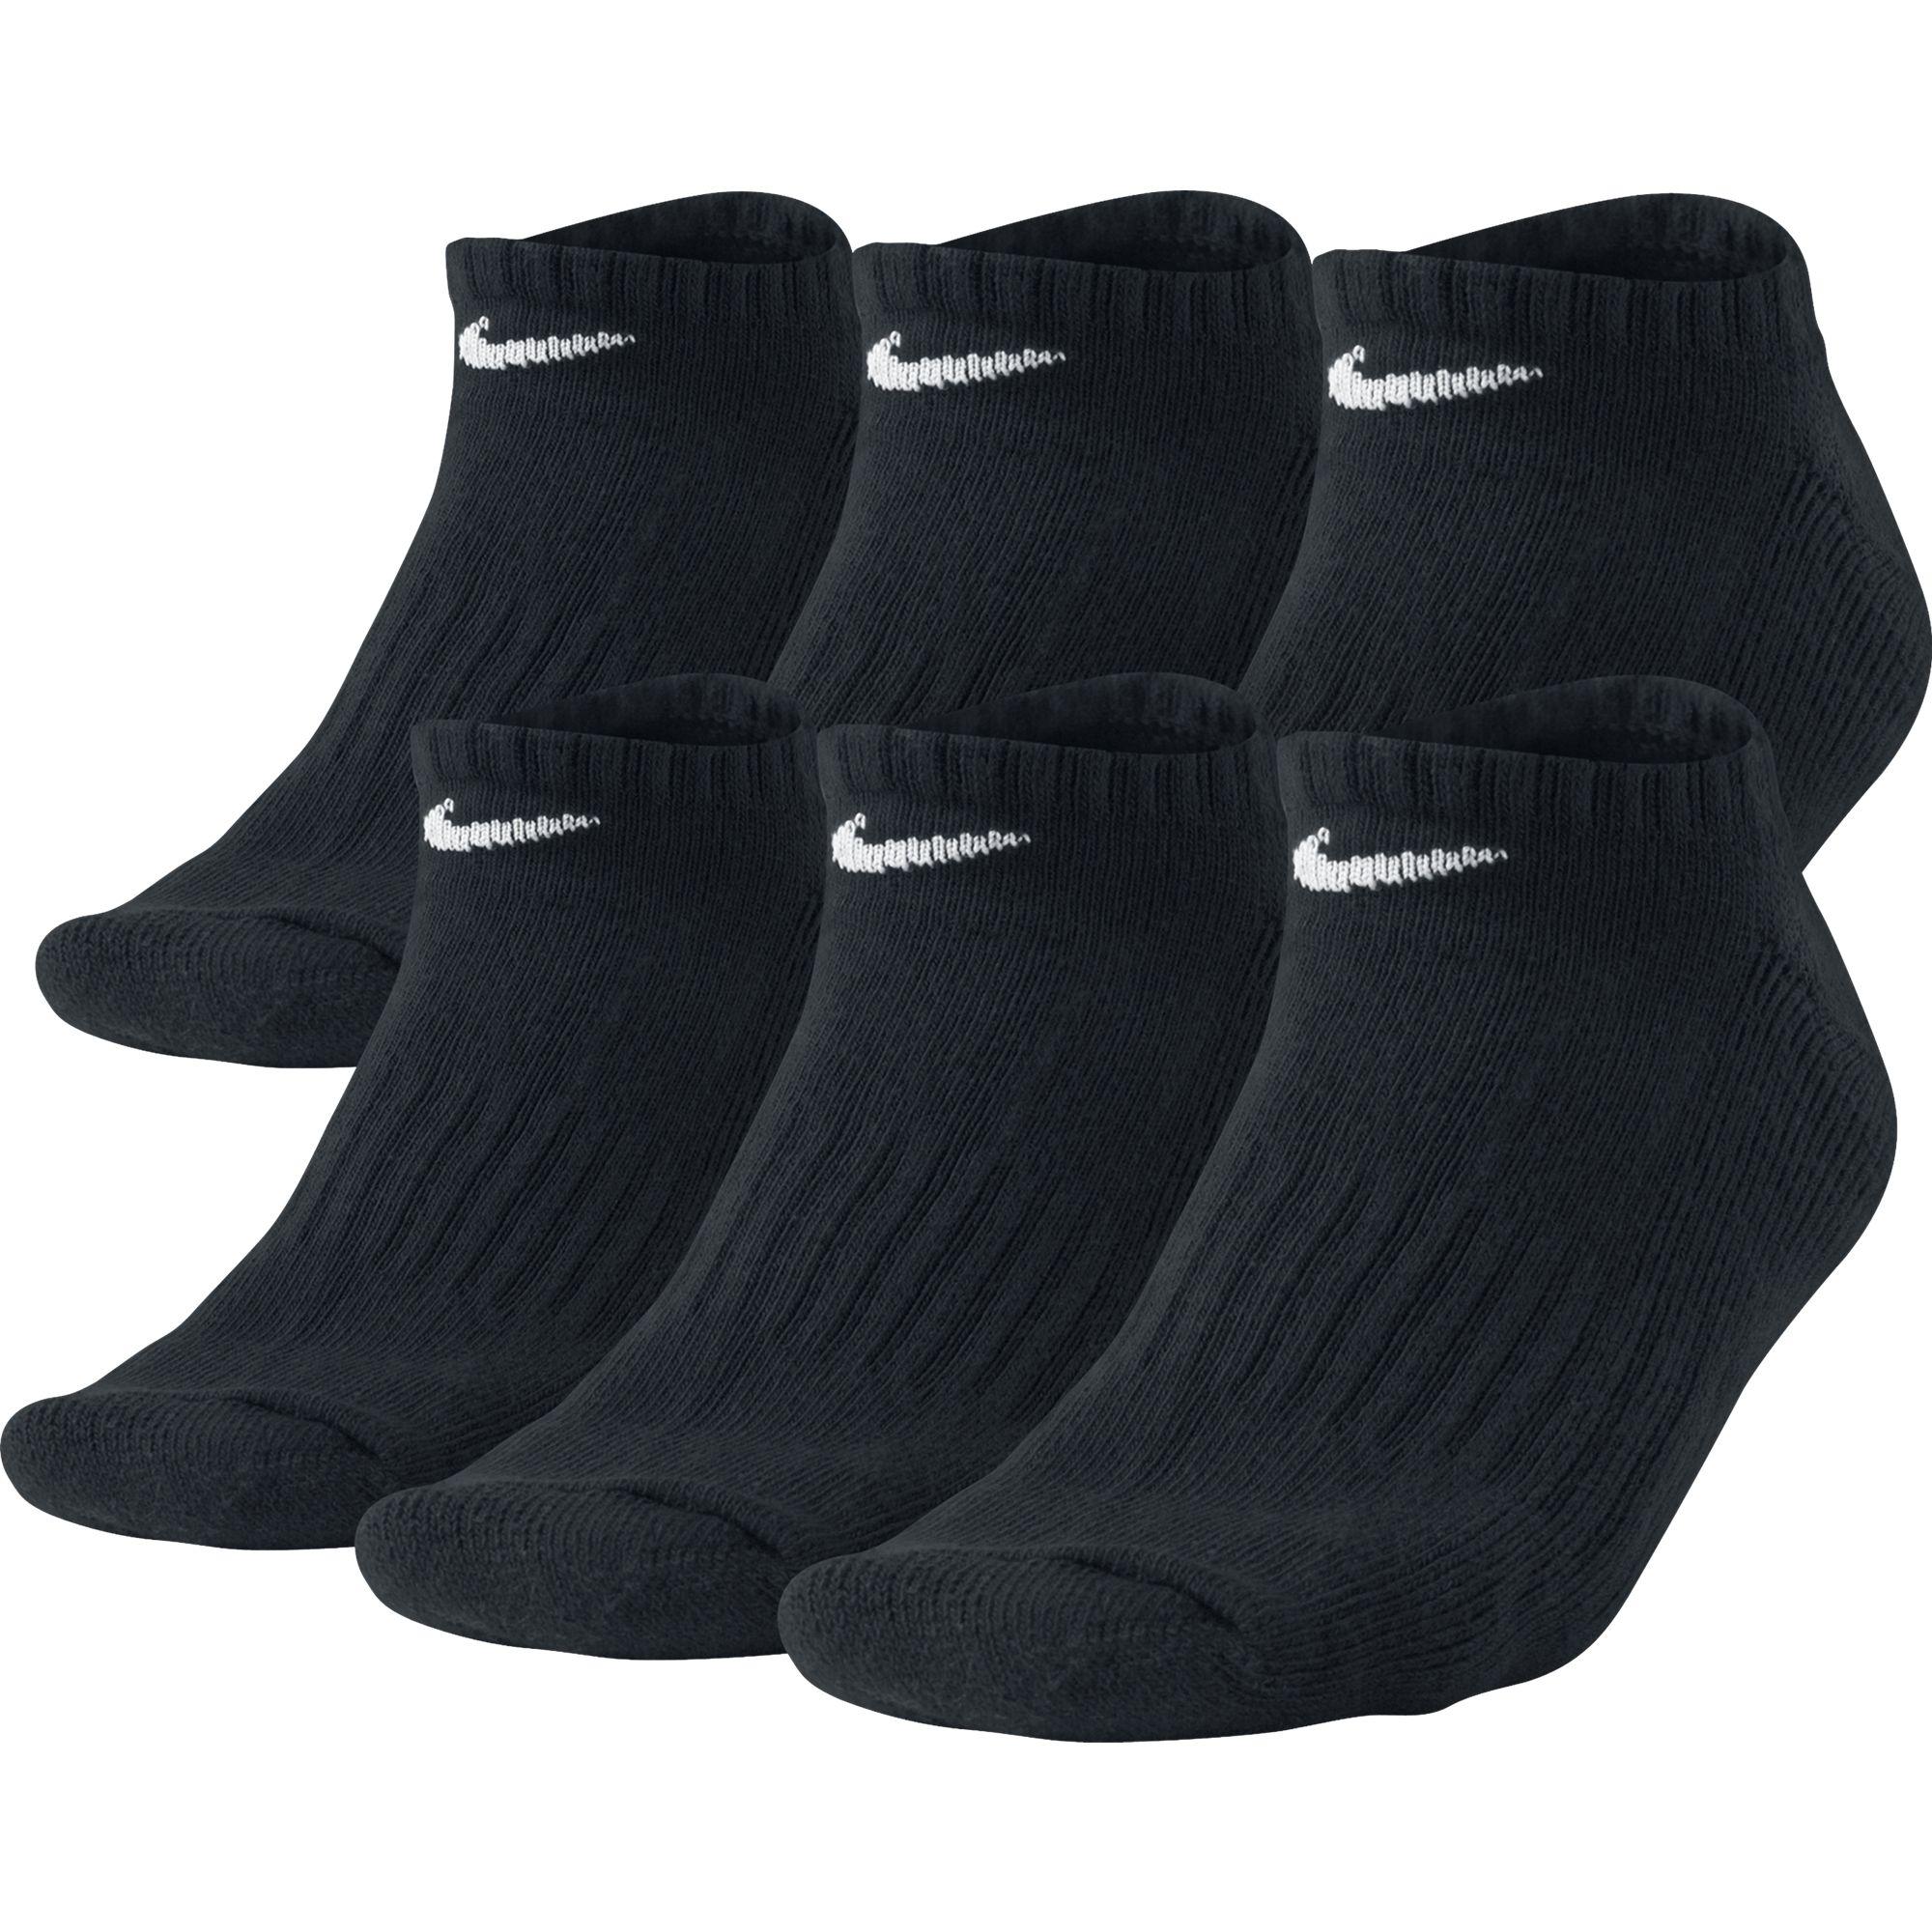 Unisex No Show Socks- 6 pack, Black, swatch